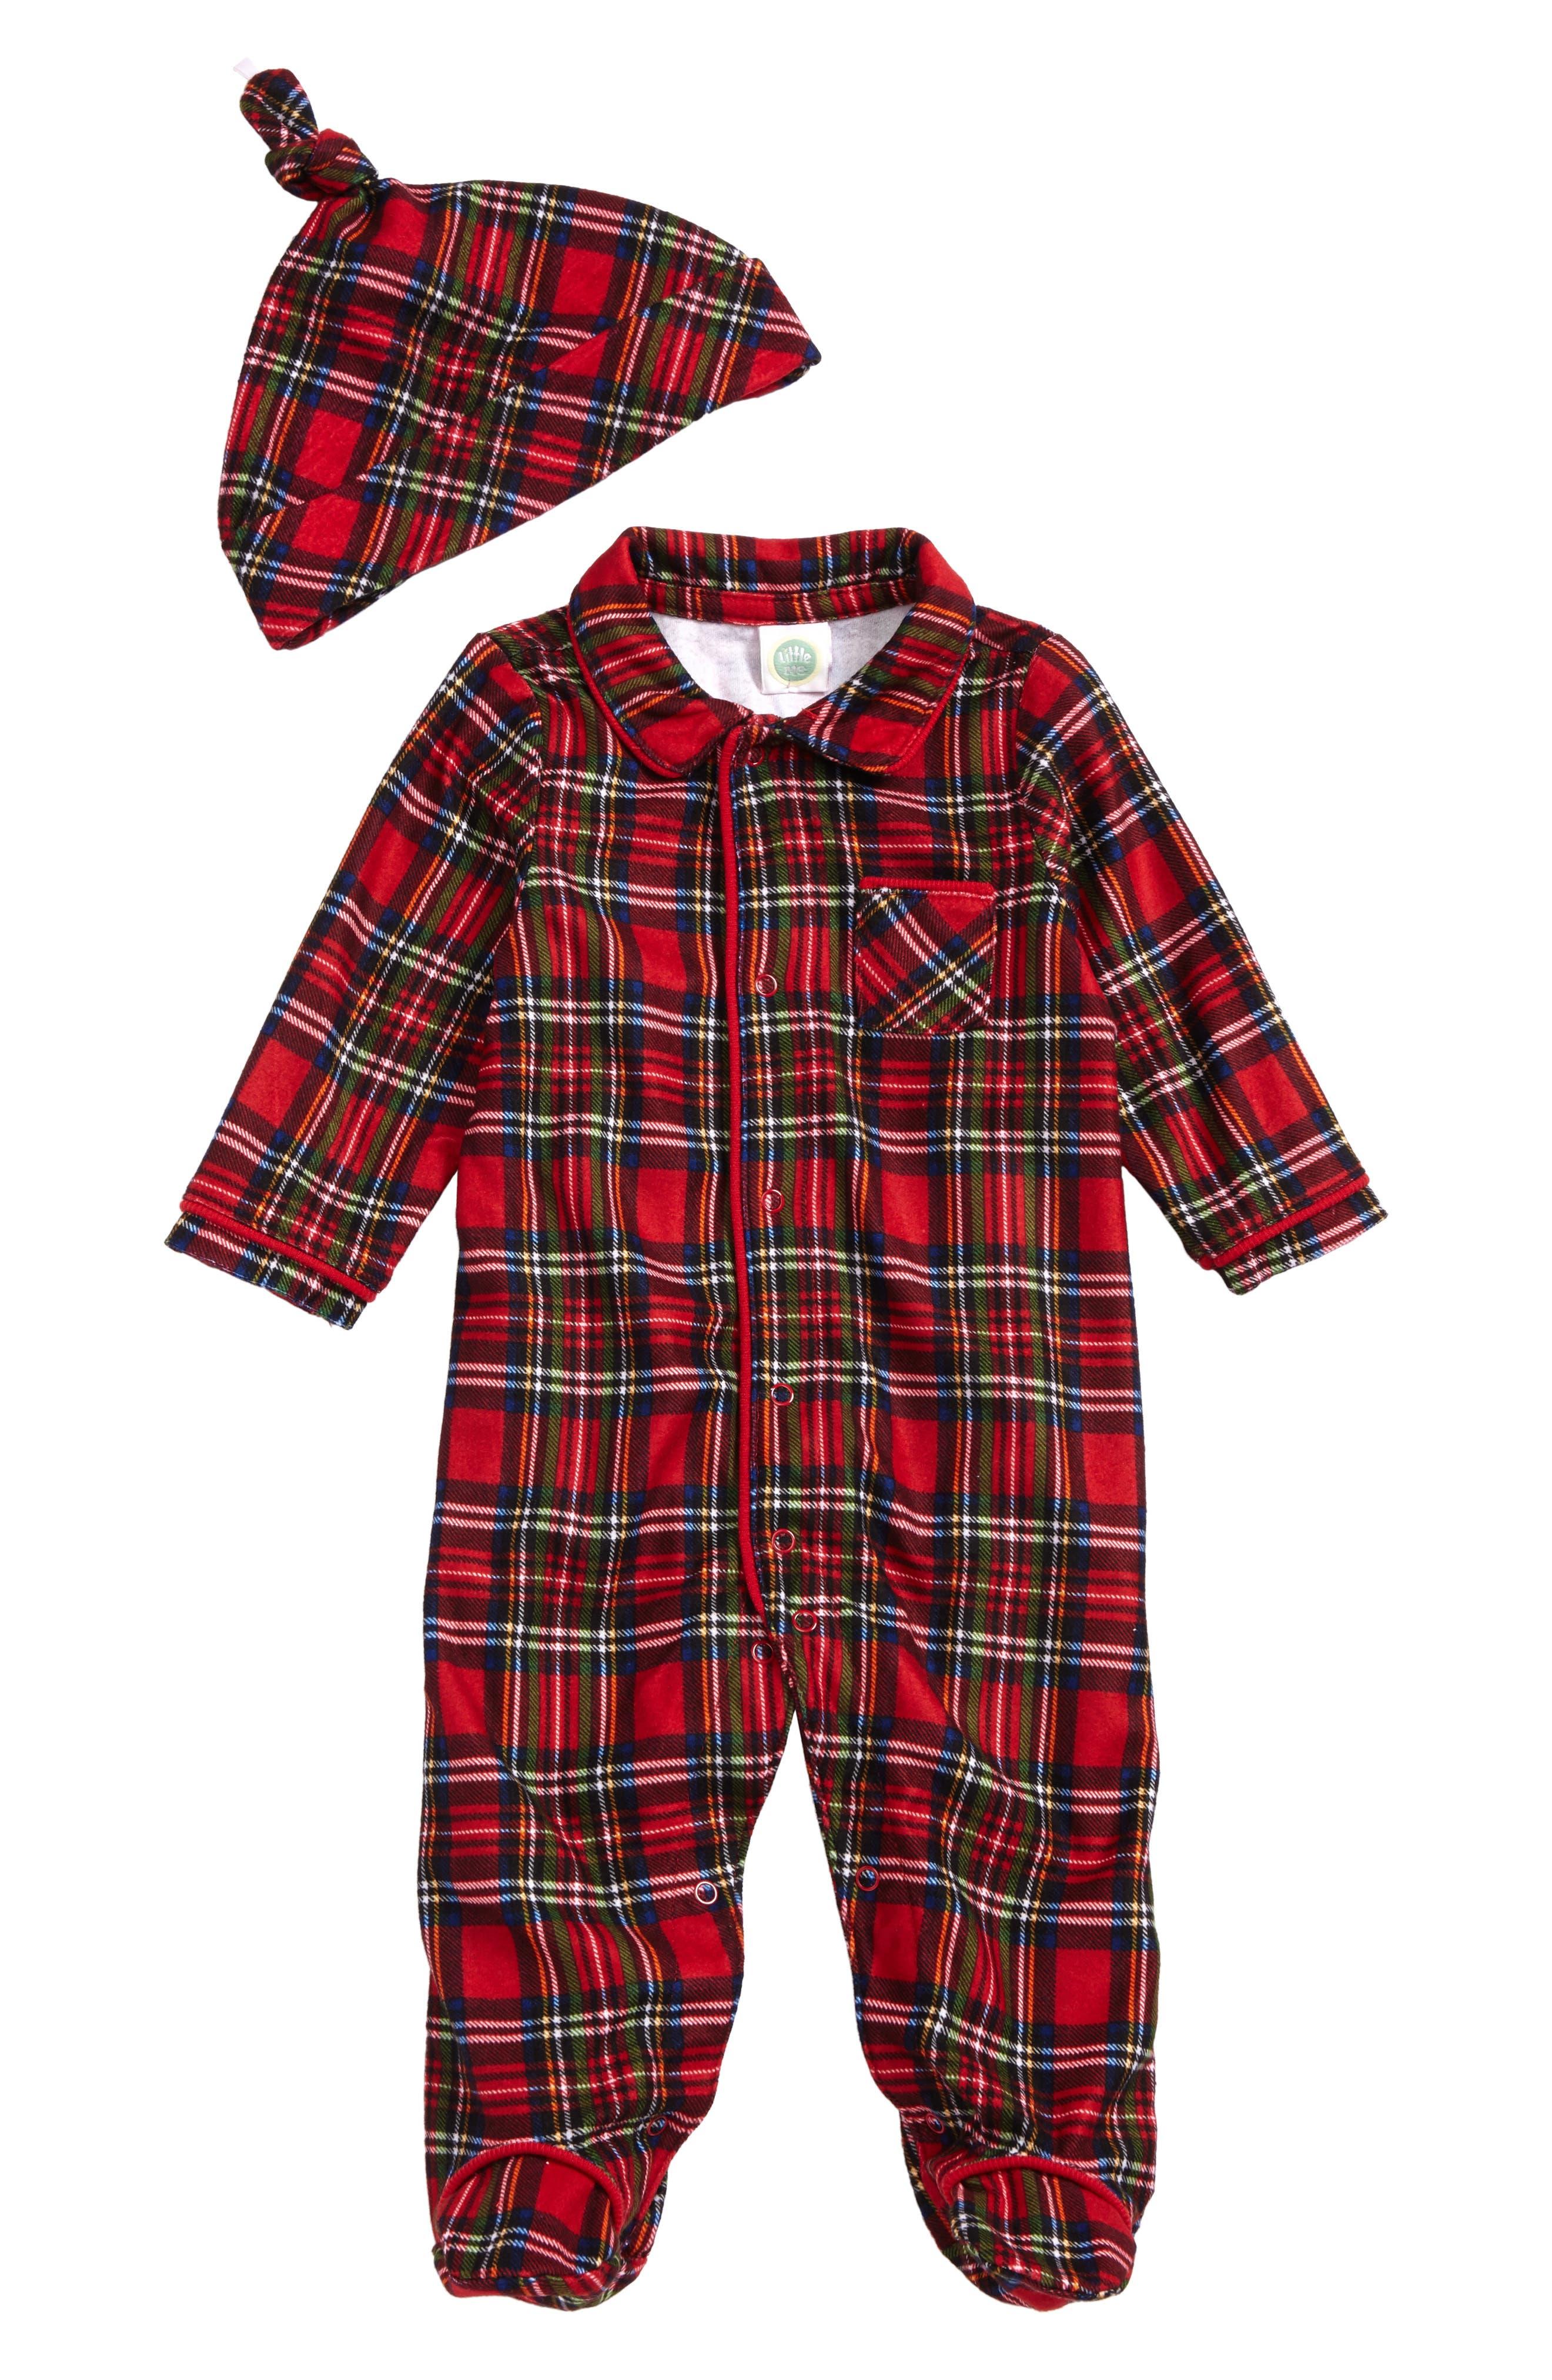 Alternate Image 1 Selected - Little Me Plaid Footie Pajamas & Hat Set (Baby Boys)